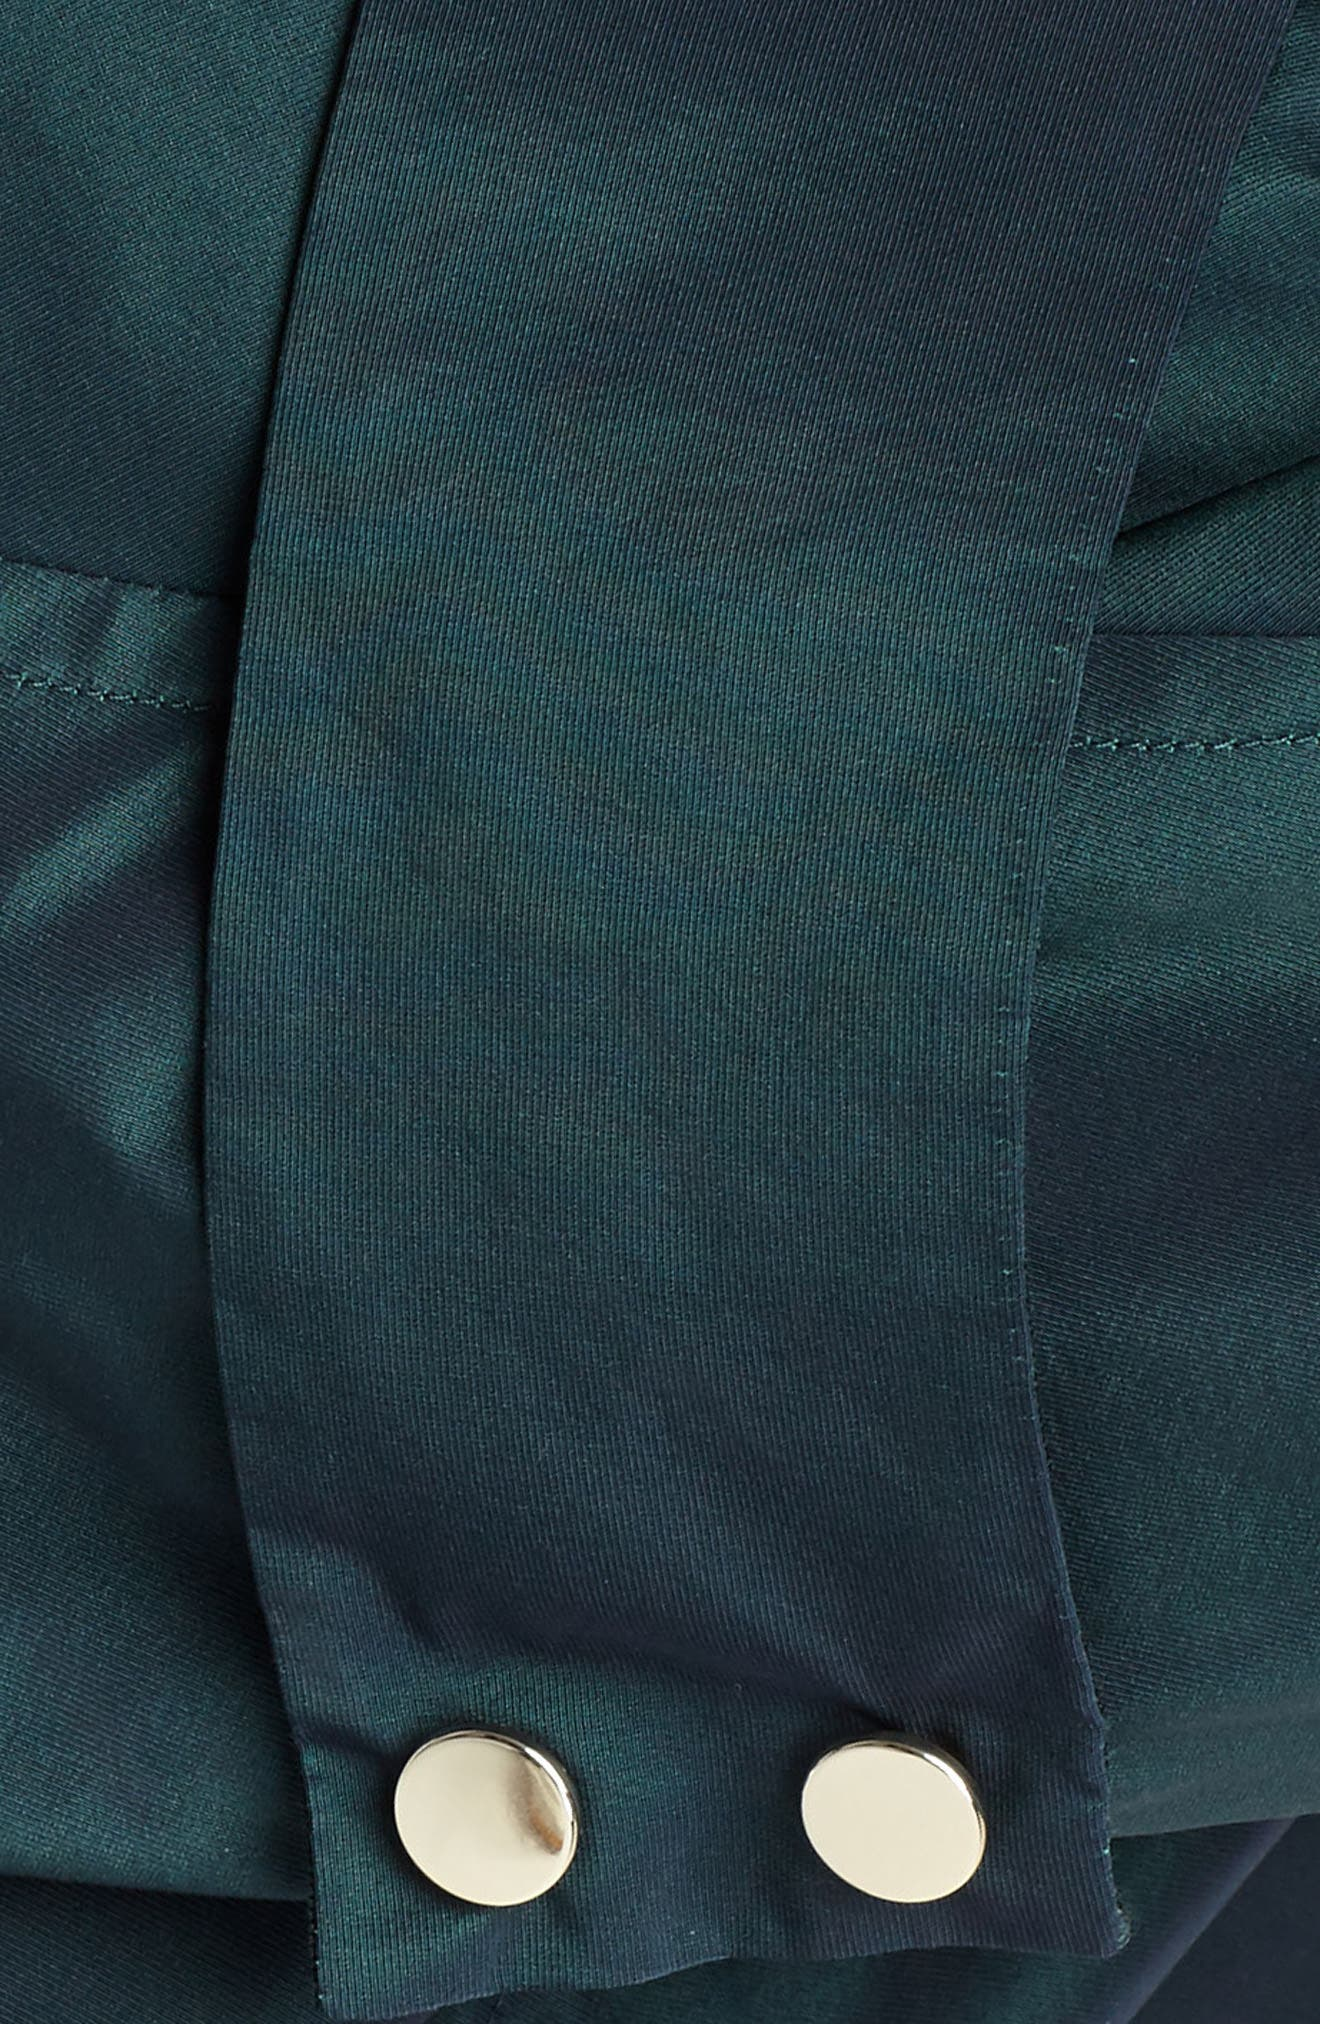 Markus Empirical Tech Cloth Jacket,                             Alternate thumbnail 4, color,                             Blue Spruce Iridescent